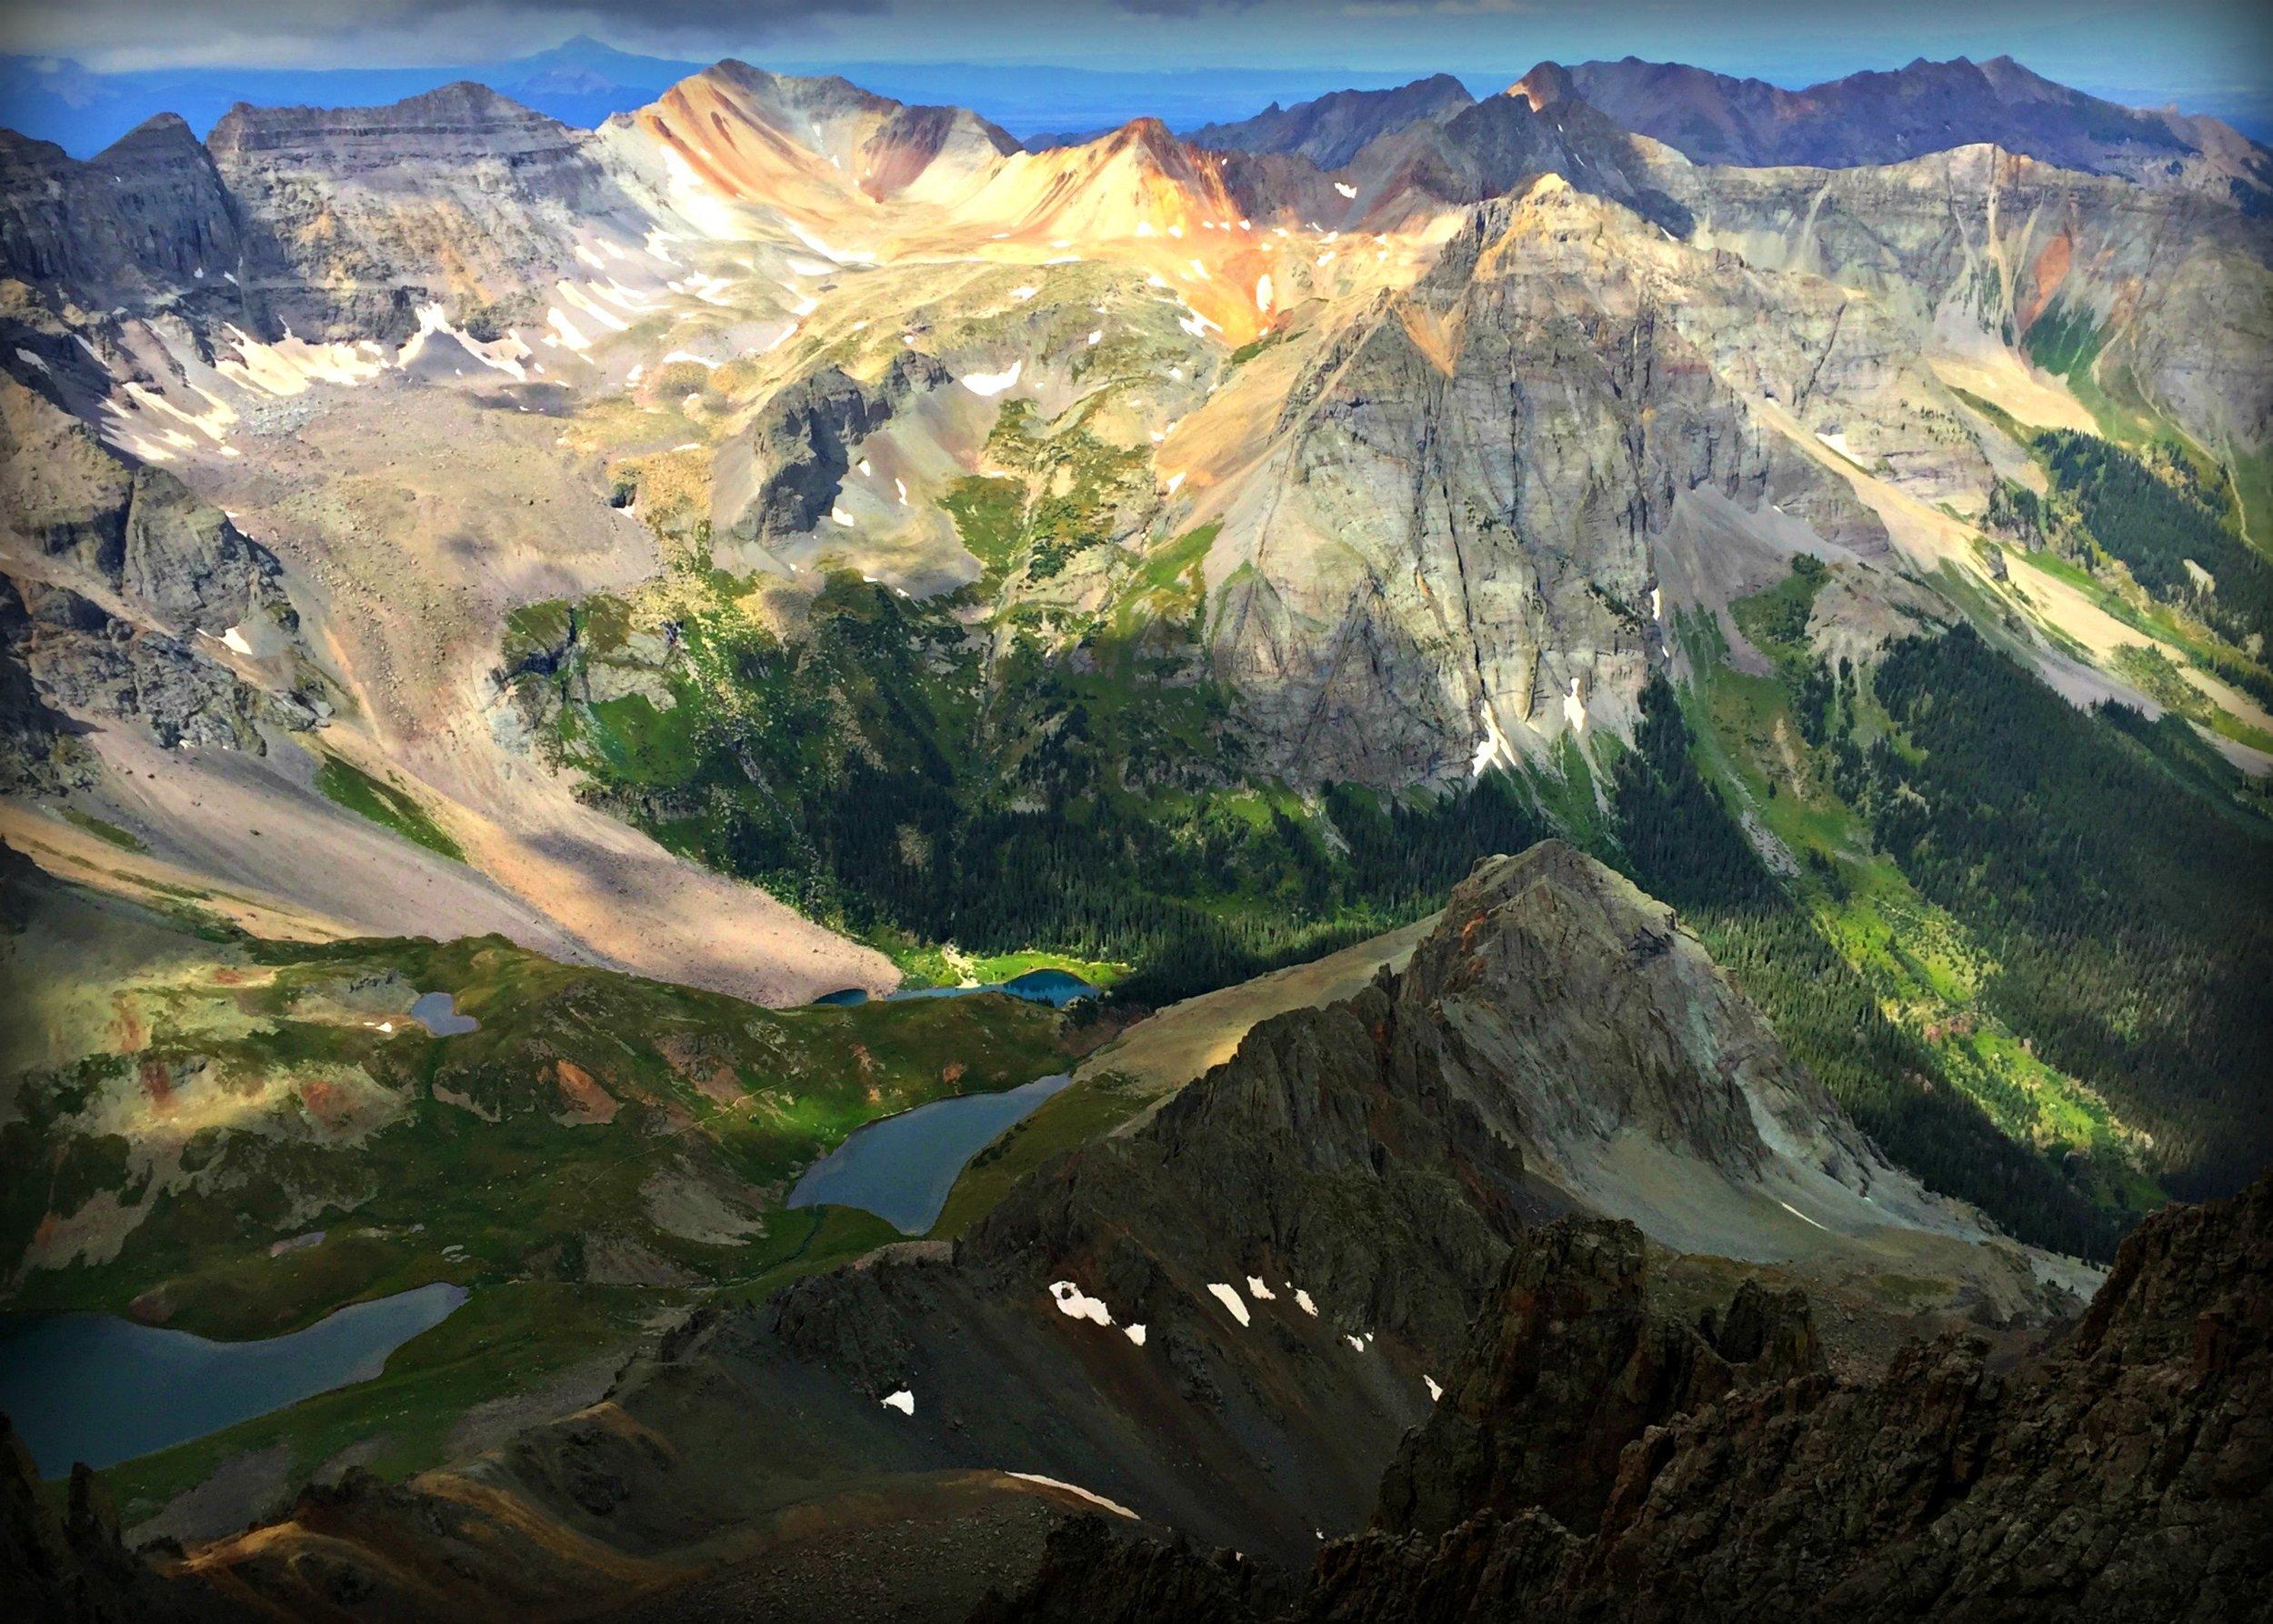 Mt. Sneffels Wilderness, Colorado